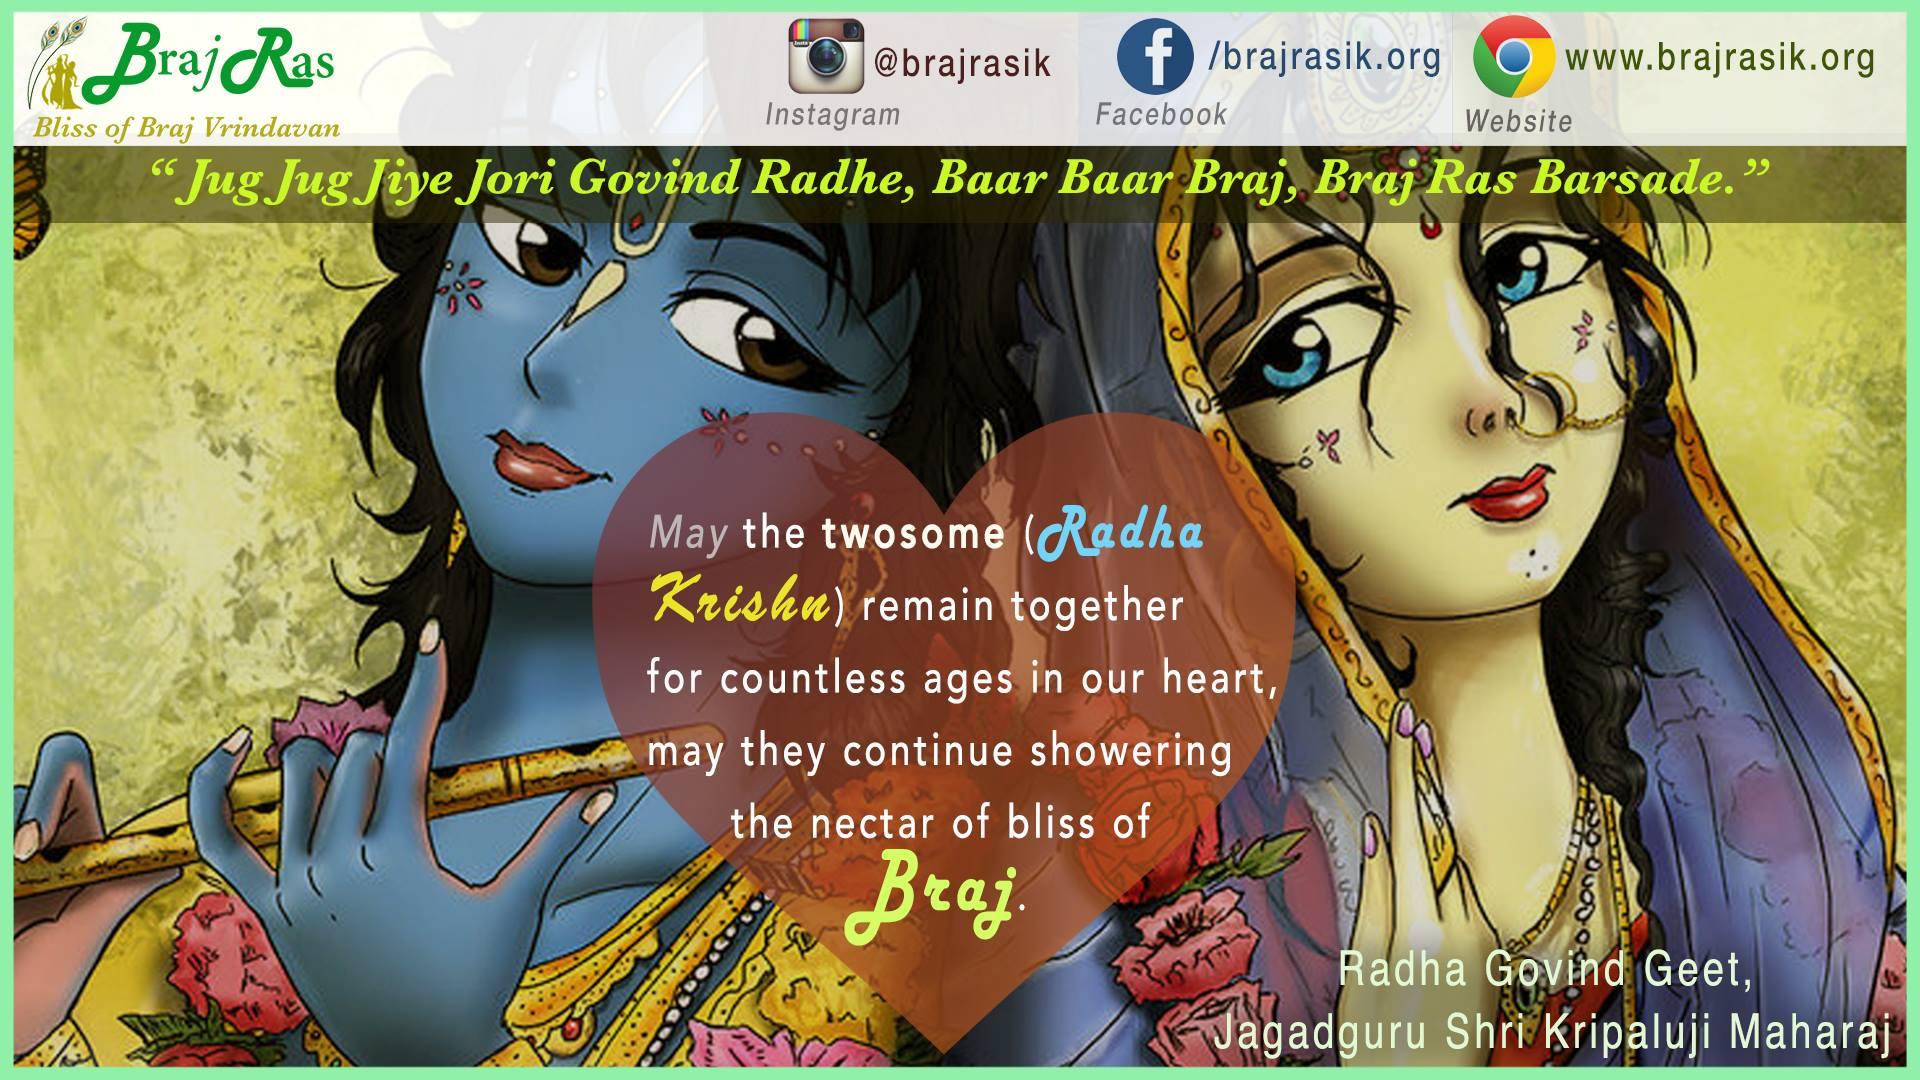 Juga Juga Jiye Jori Govind Radhe - Jagadguru Shri Kripaluji Maharaj